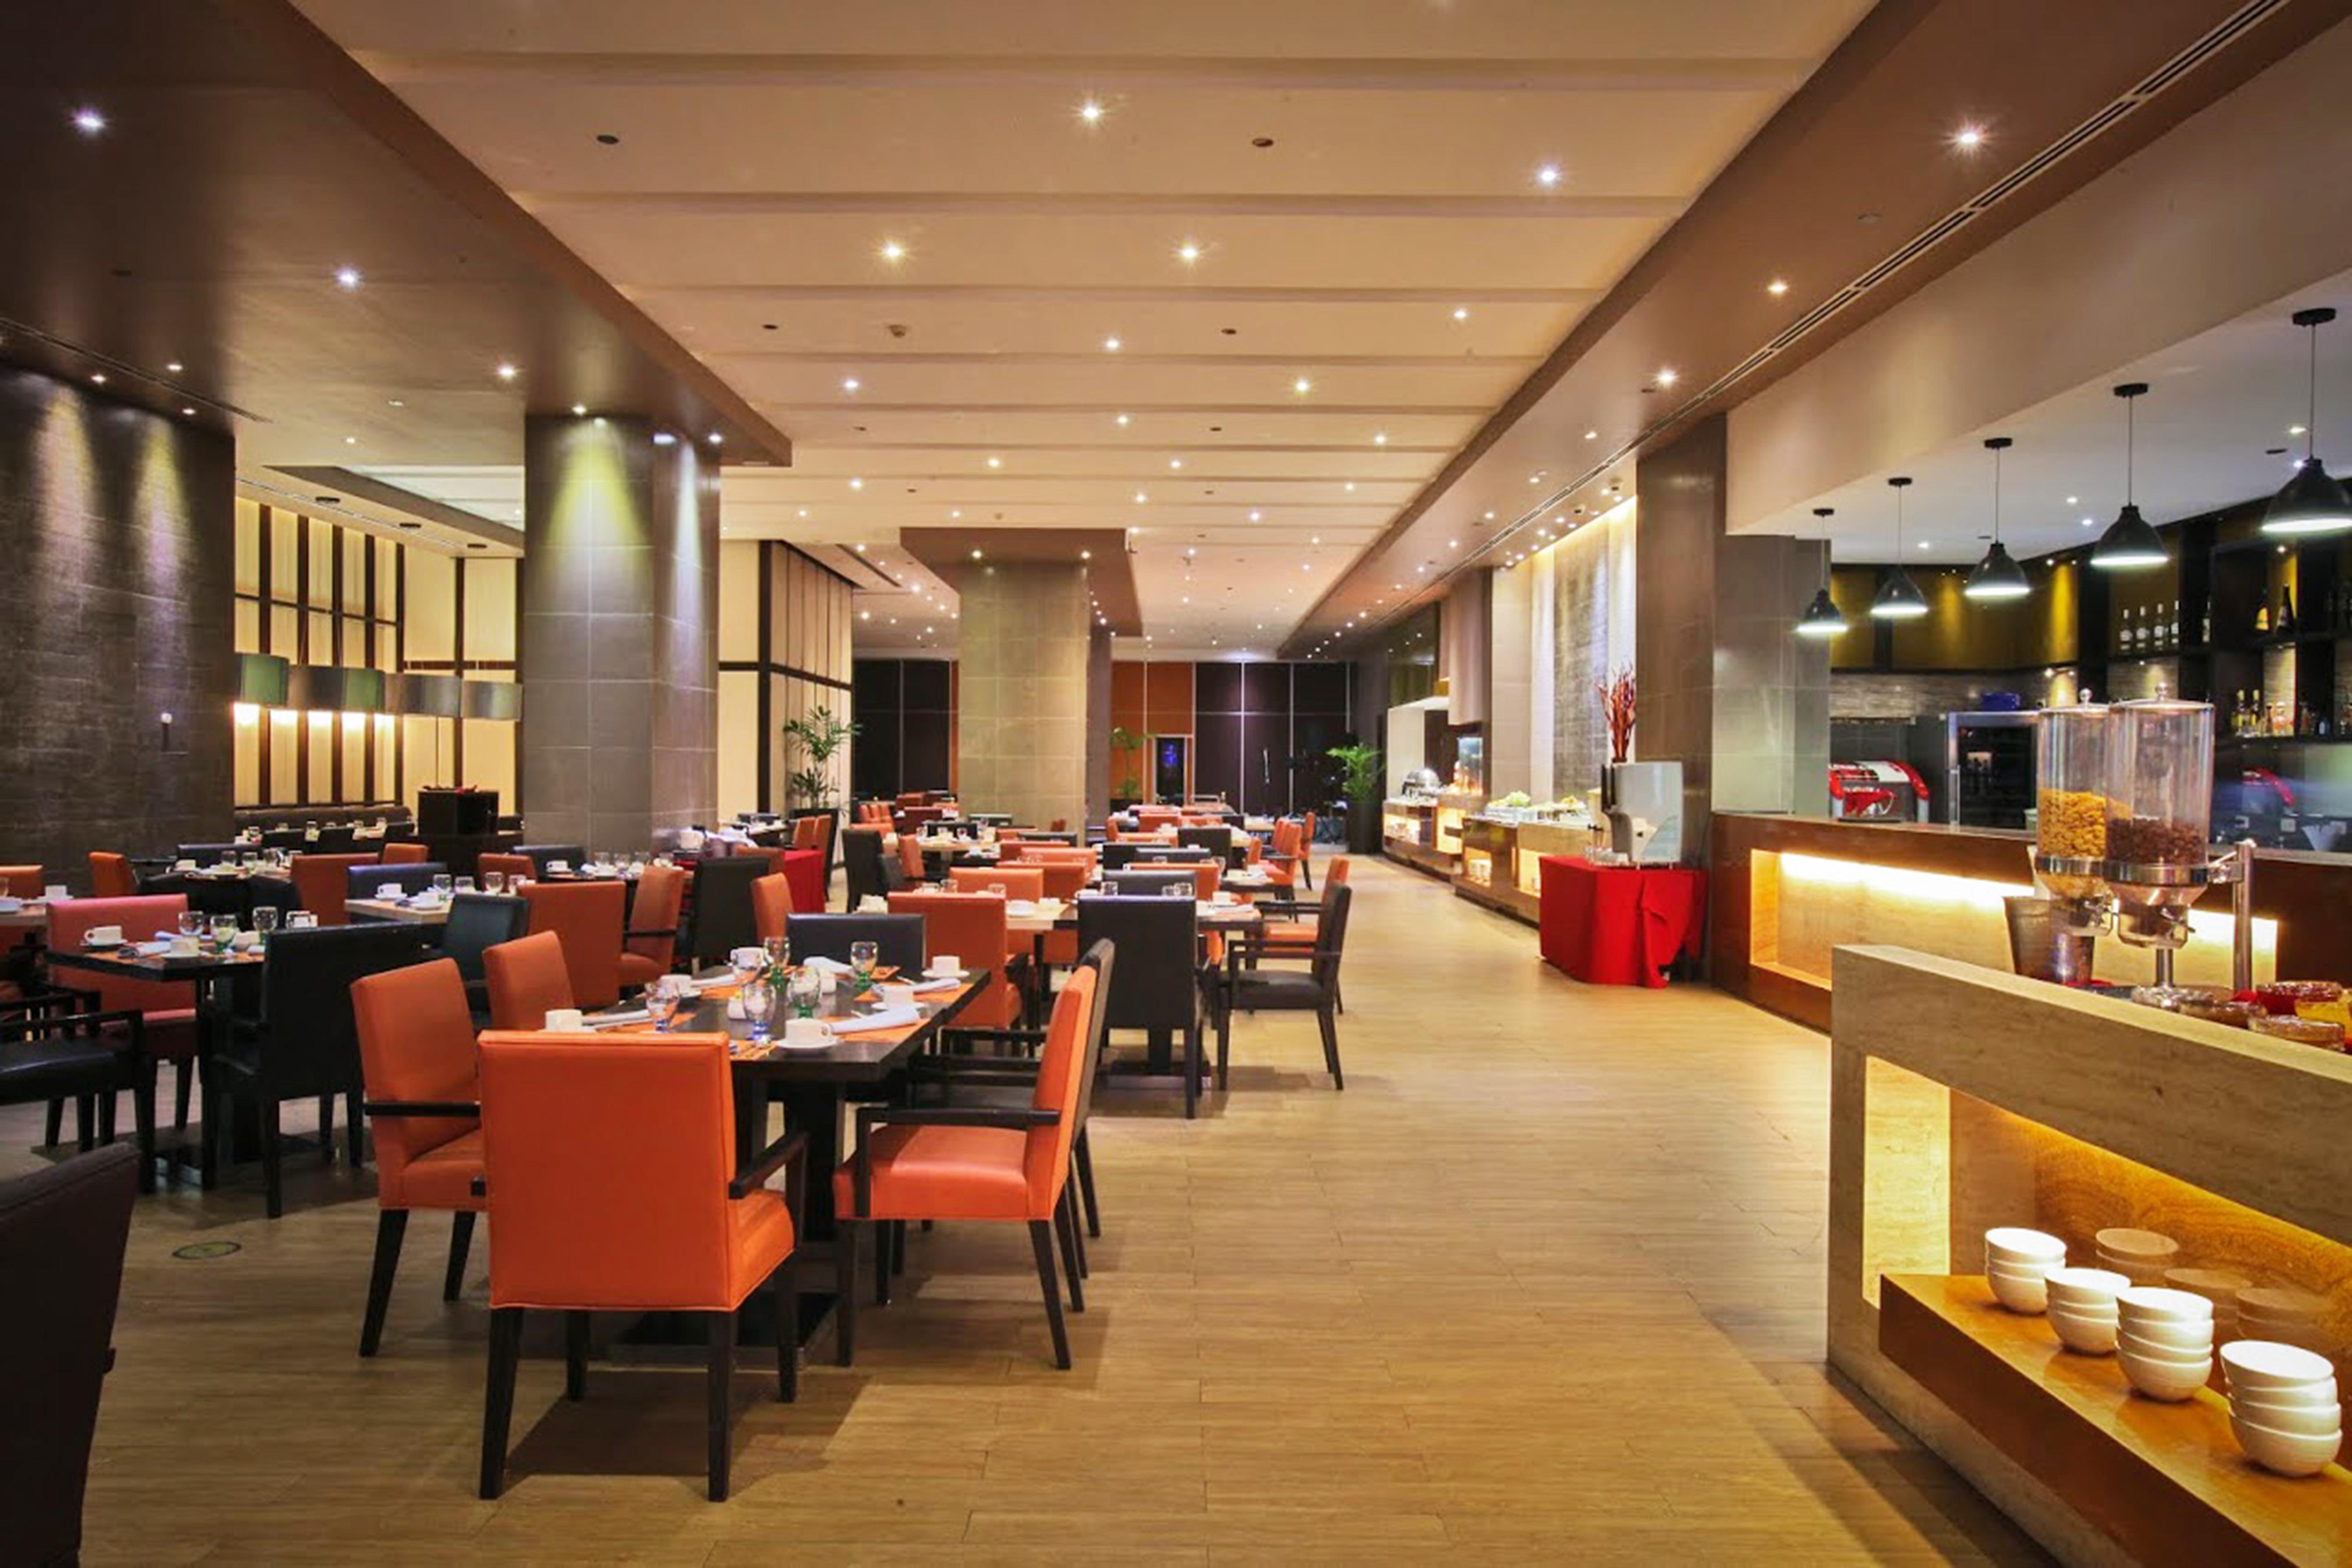 100 Hotel Dining Room Limketkai Luxe Cdo